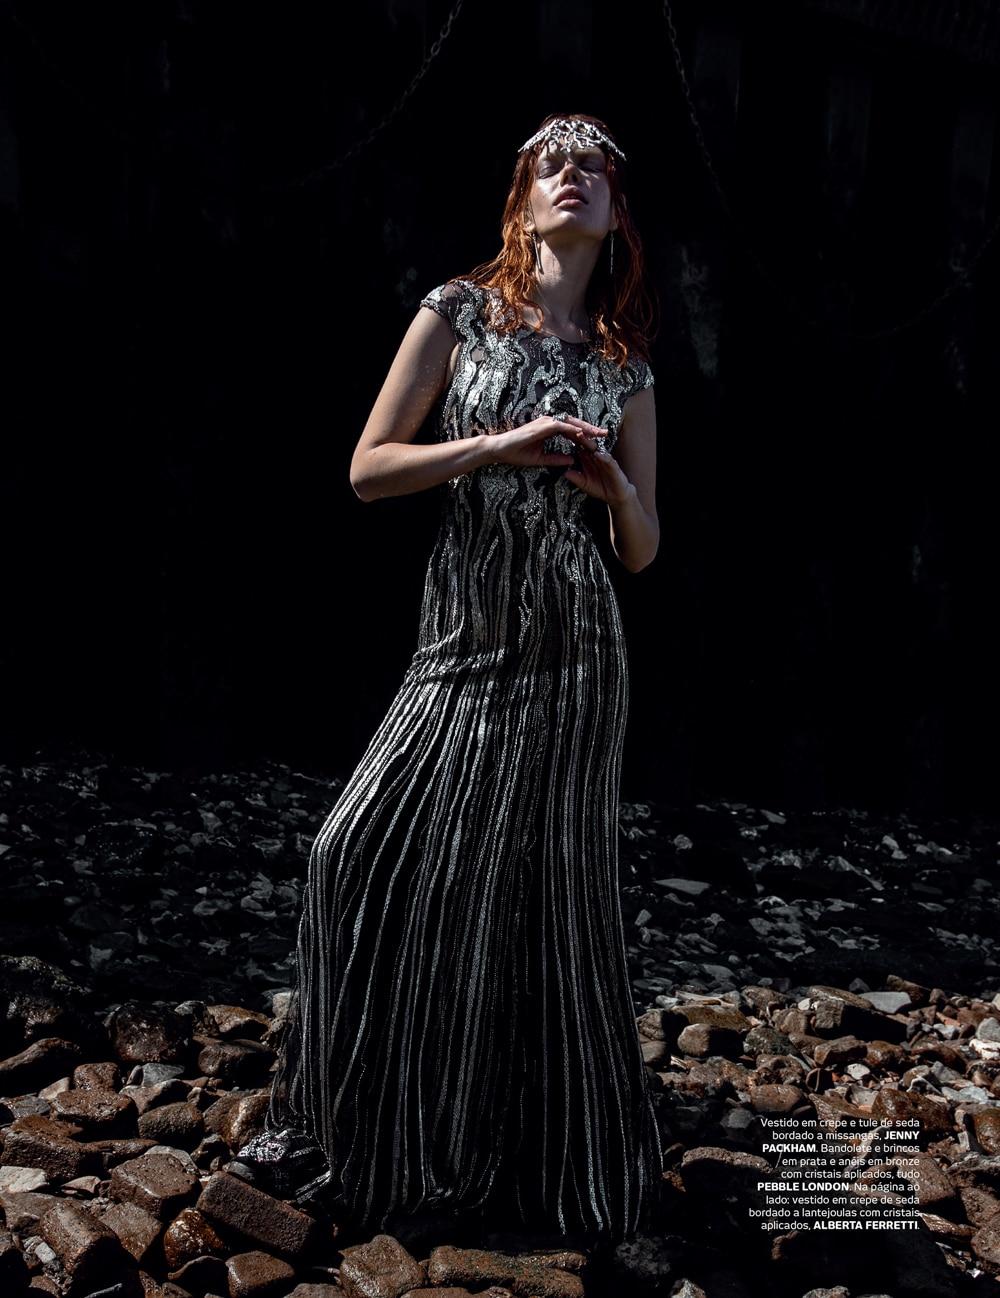 Vogue-Portugal-Nika-Rusakova-Filip-Koludrovic-15.jpg